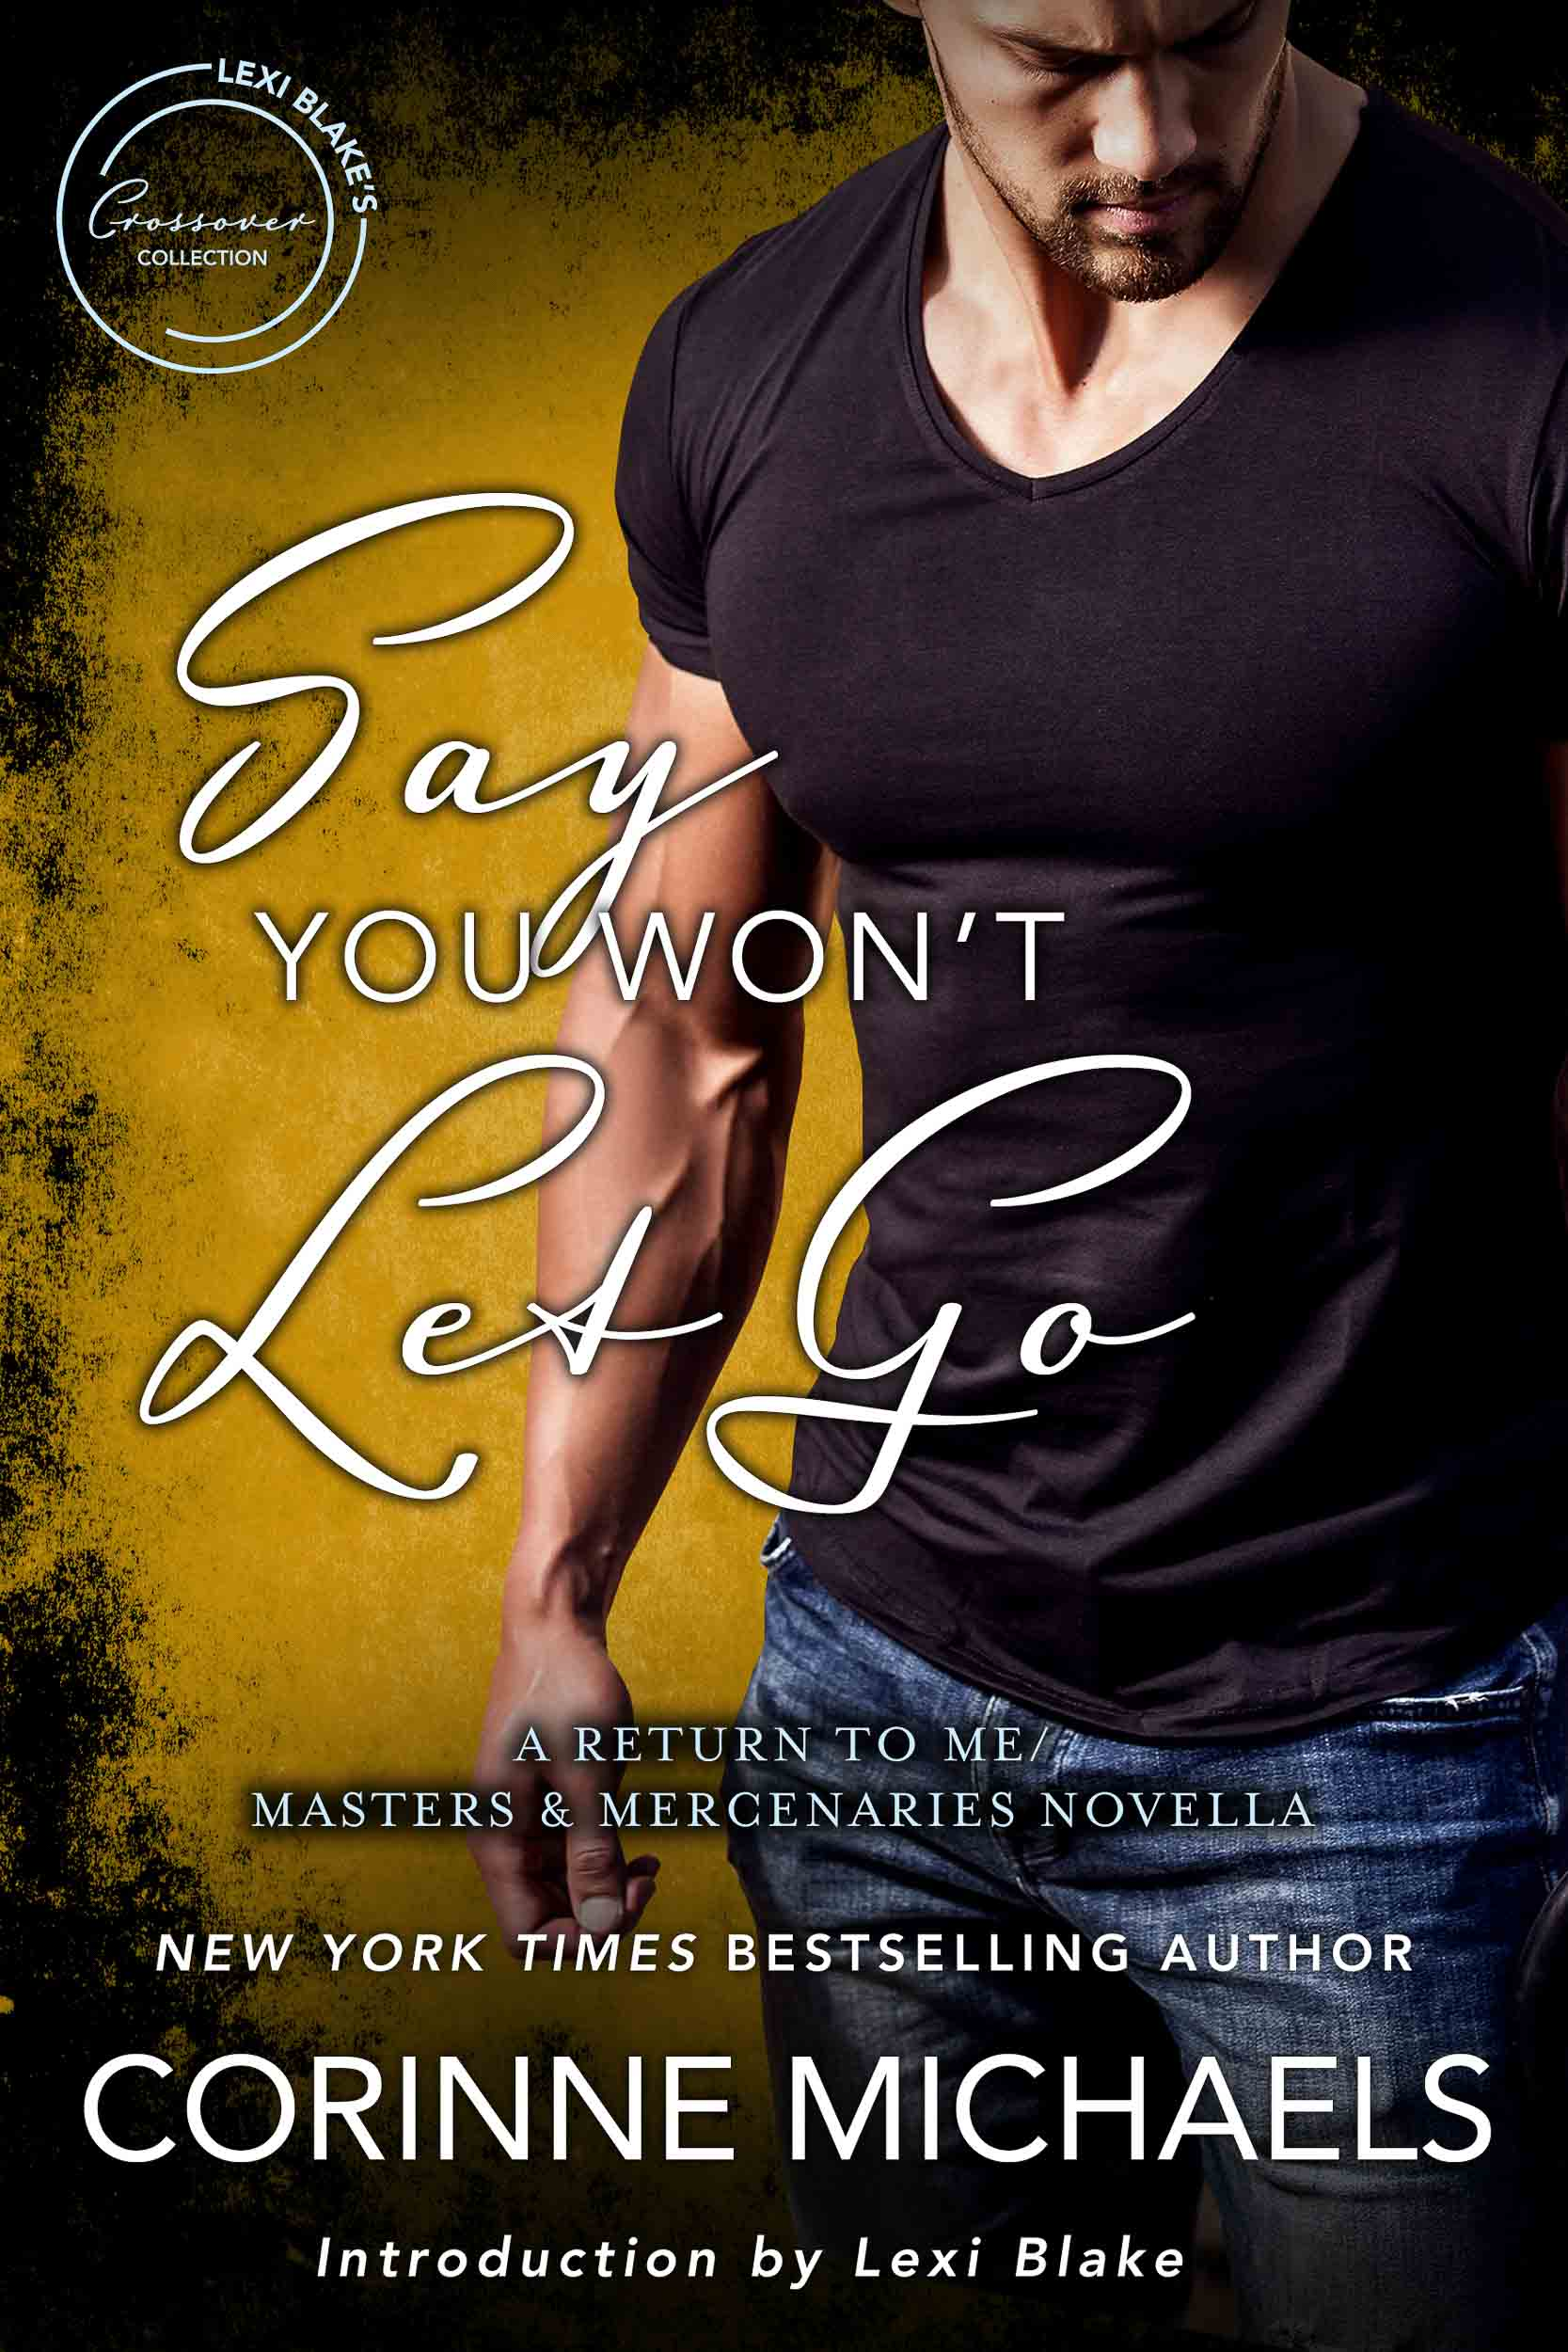 Lexi Blake Say You Won't Let Go.jpg